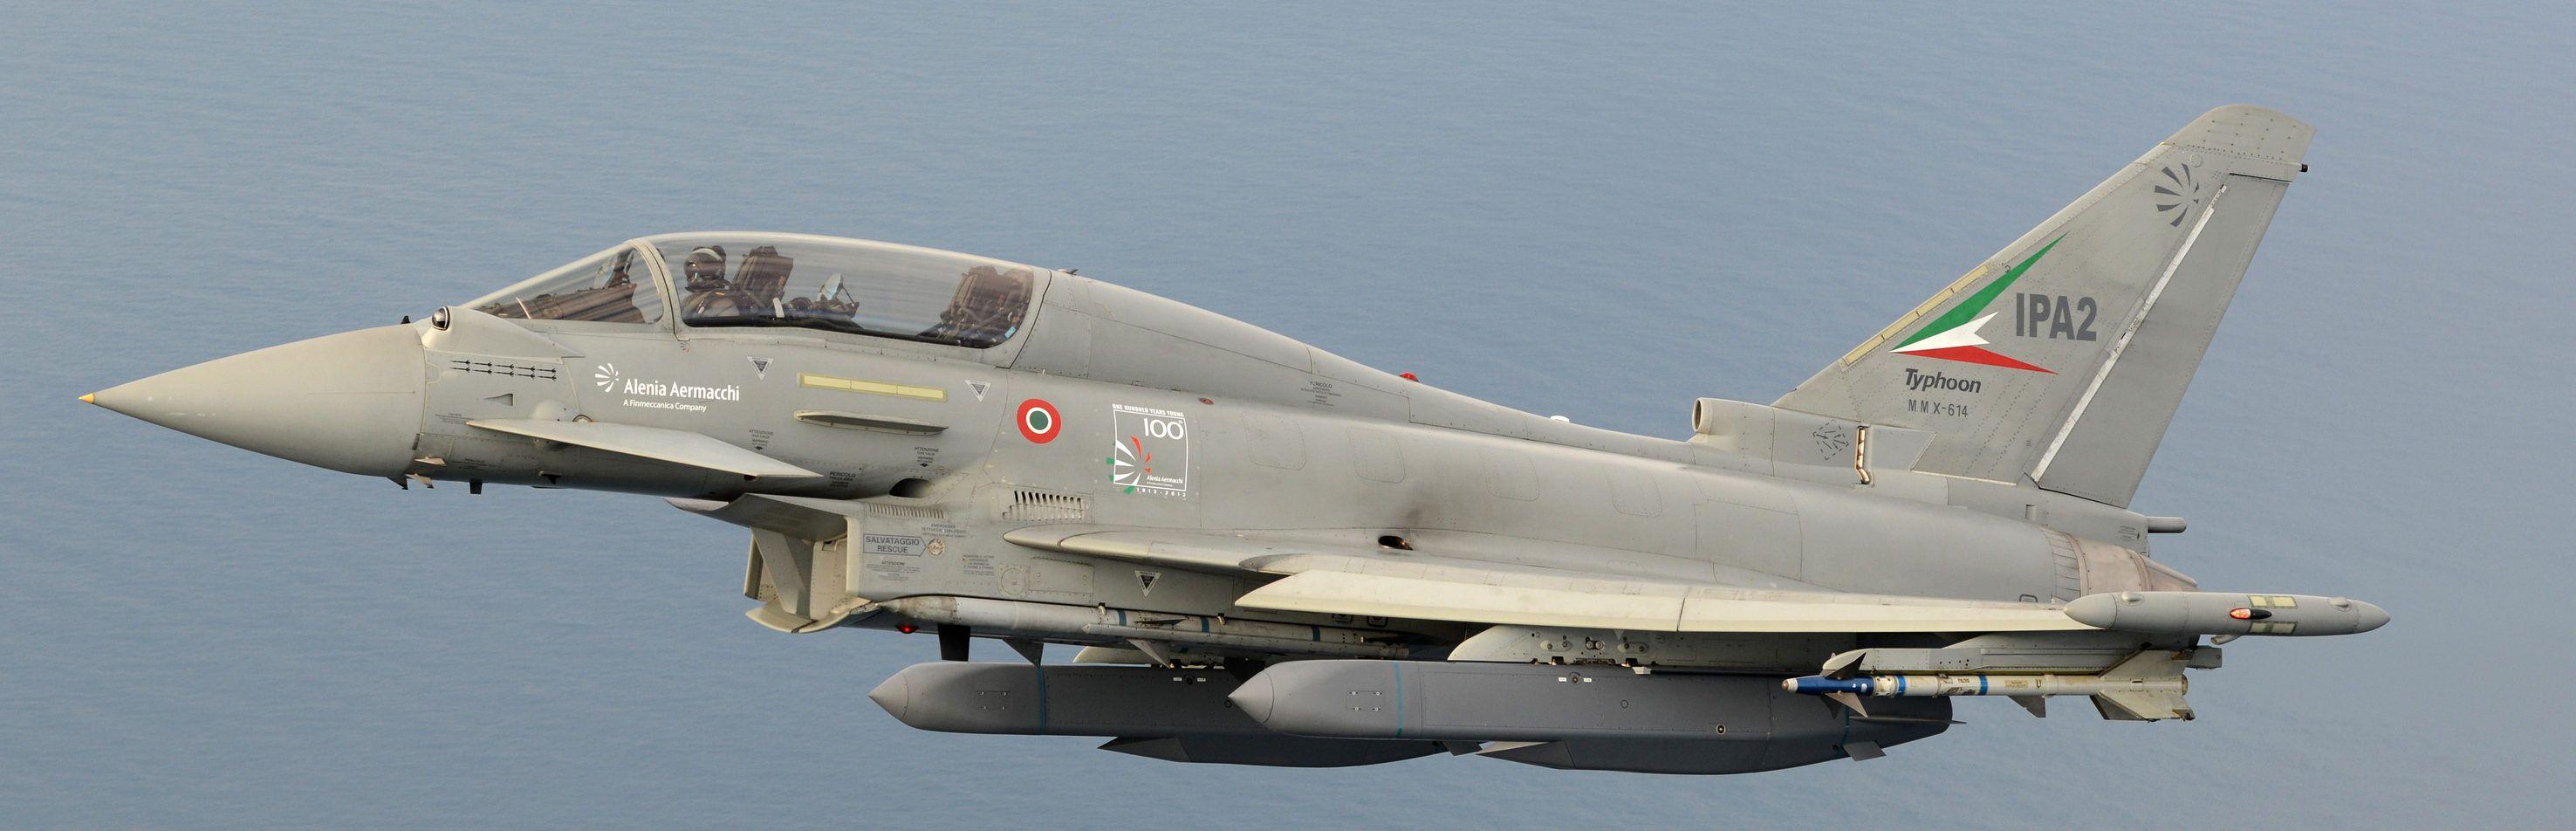 Eurofighter Typhoon Storm Shadow Initial Flight Trials